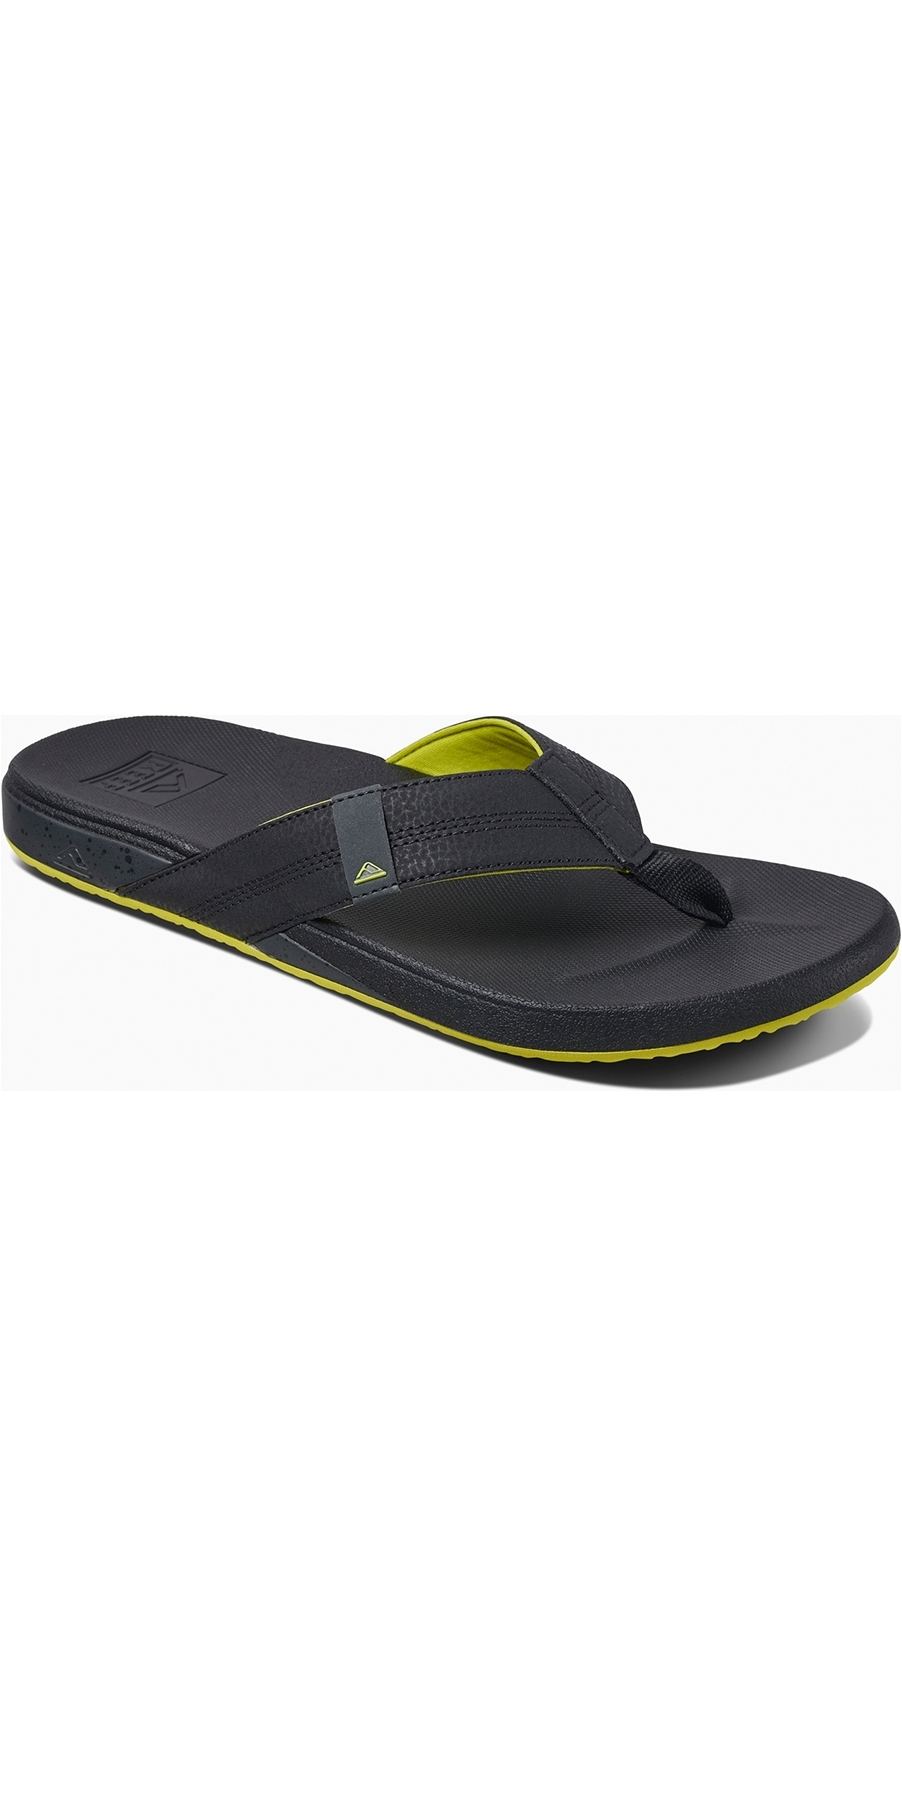 7f1d9397161 Reef Mens Cushion Bounce Phantom Flip Flops Grey/Green RF0A3FDI | Footwear  | Wetsuitoutlet | Wetsuit Outlet